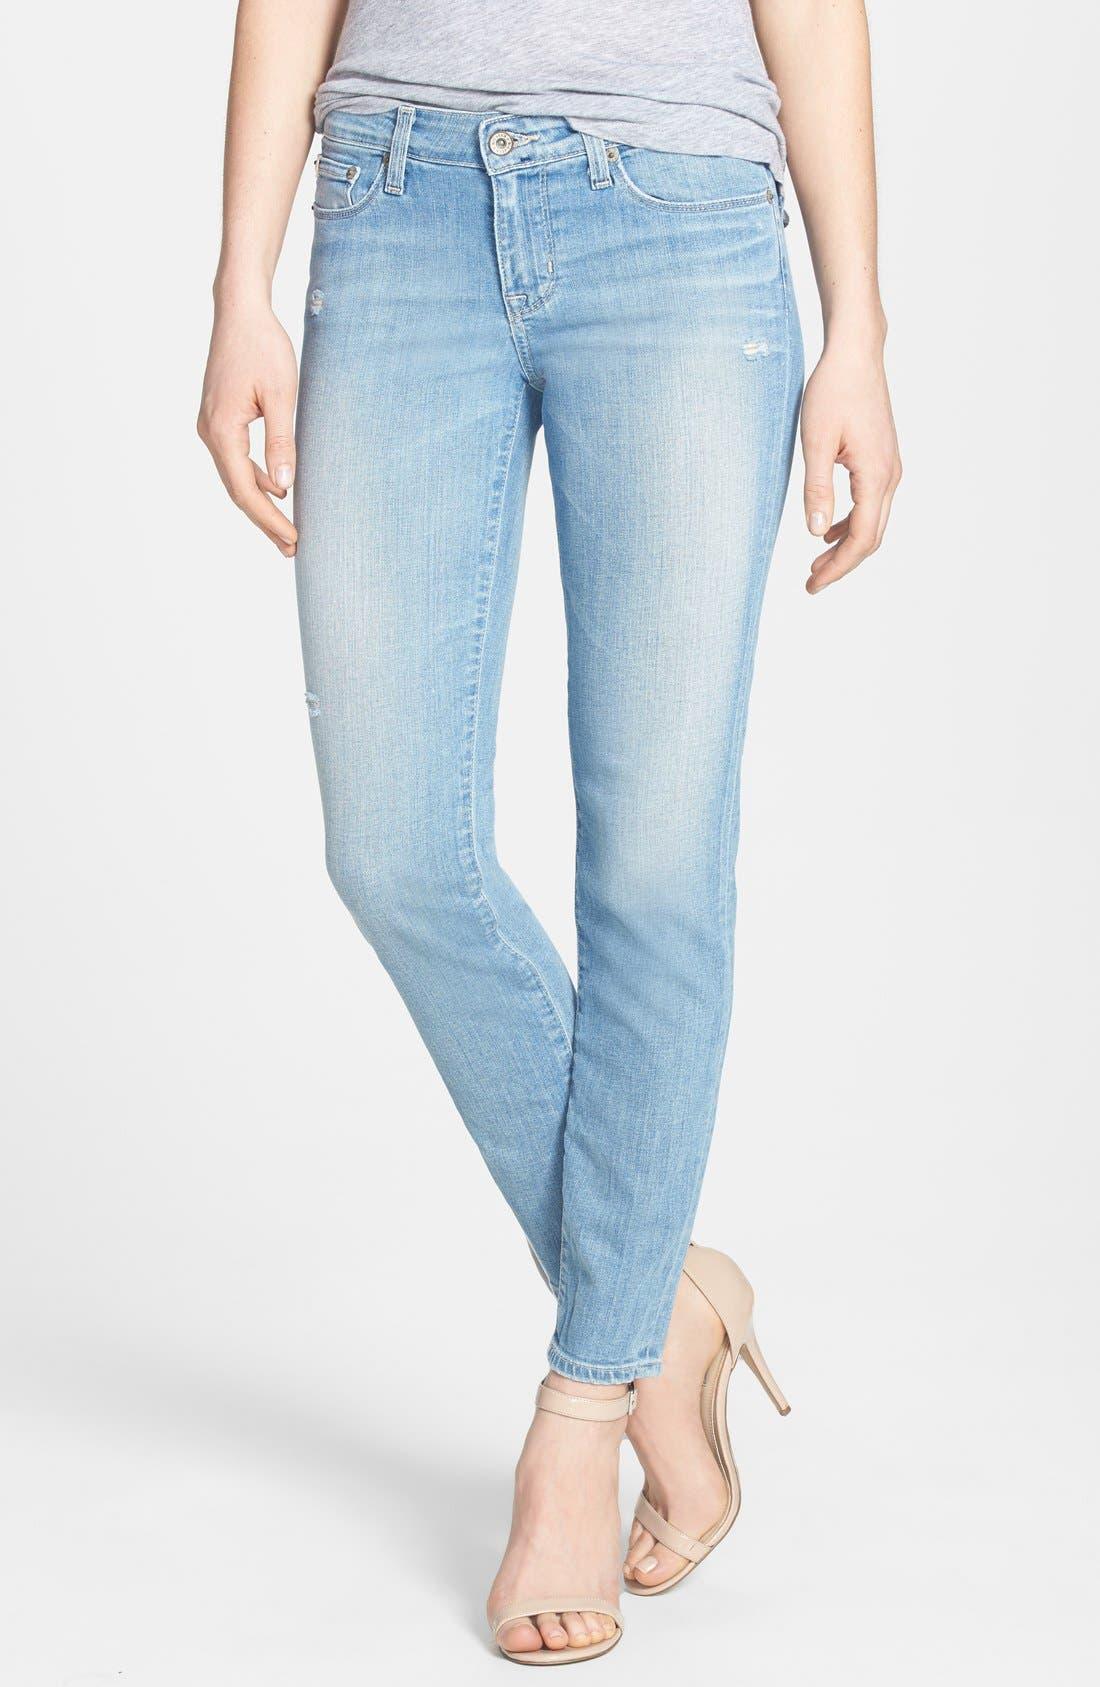 Main Image - Big Star 'Alex' Distressed Stretch Skinny Jeans (20-Year Harbor) (Petite)